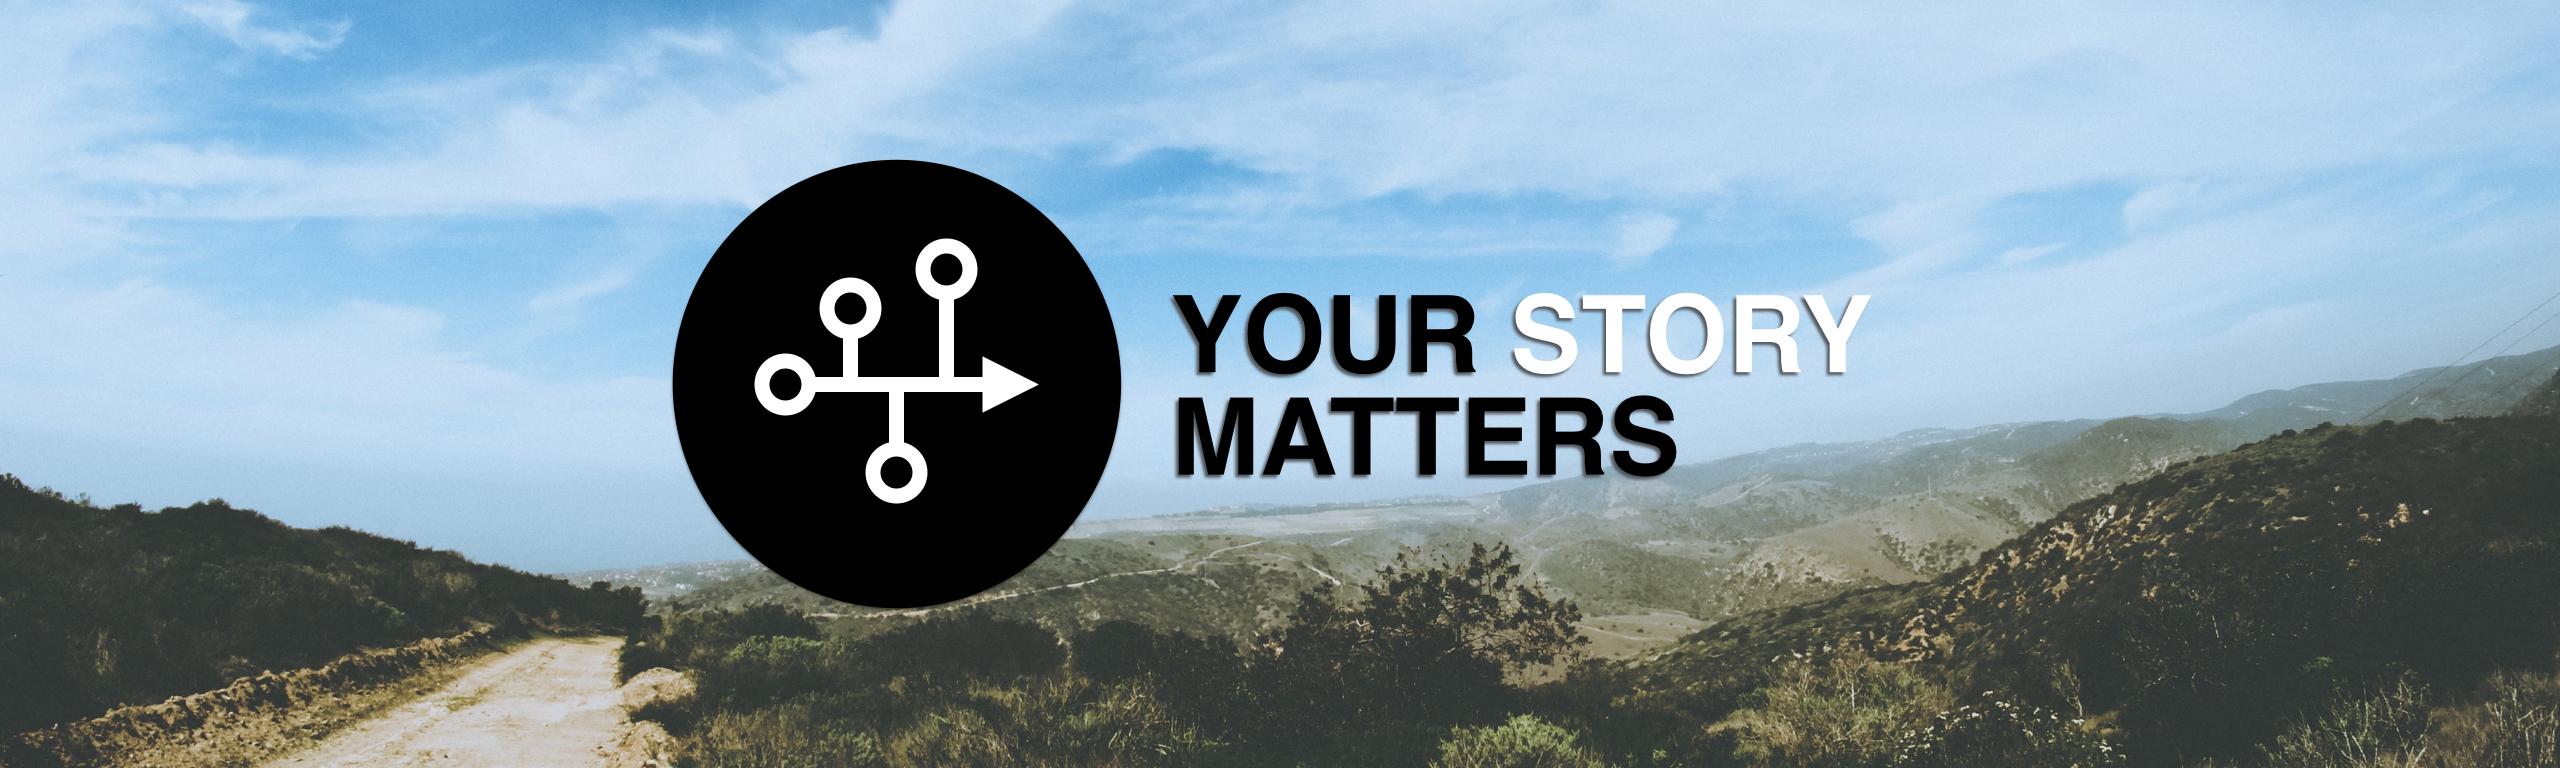 Your Story Matters - Center Screen - FINAL.001